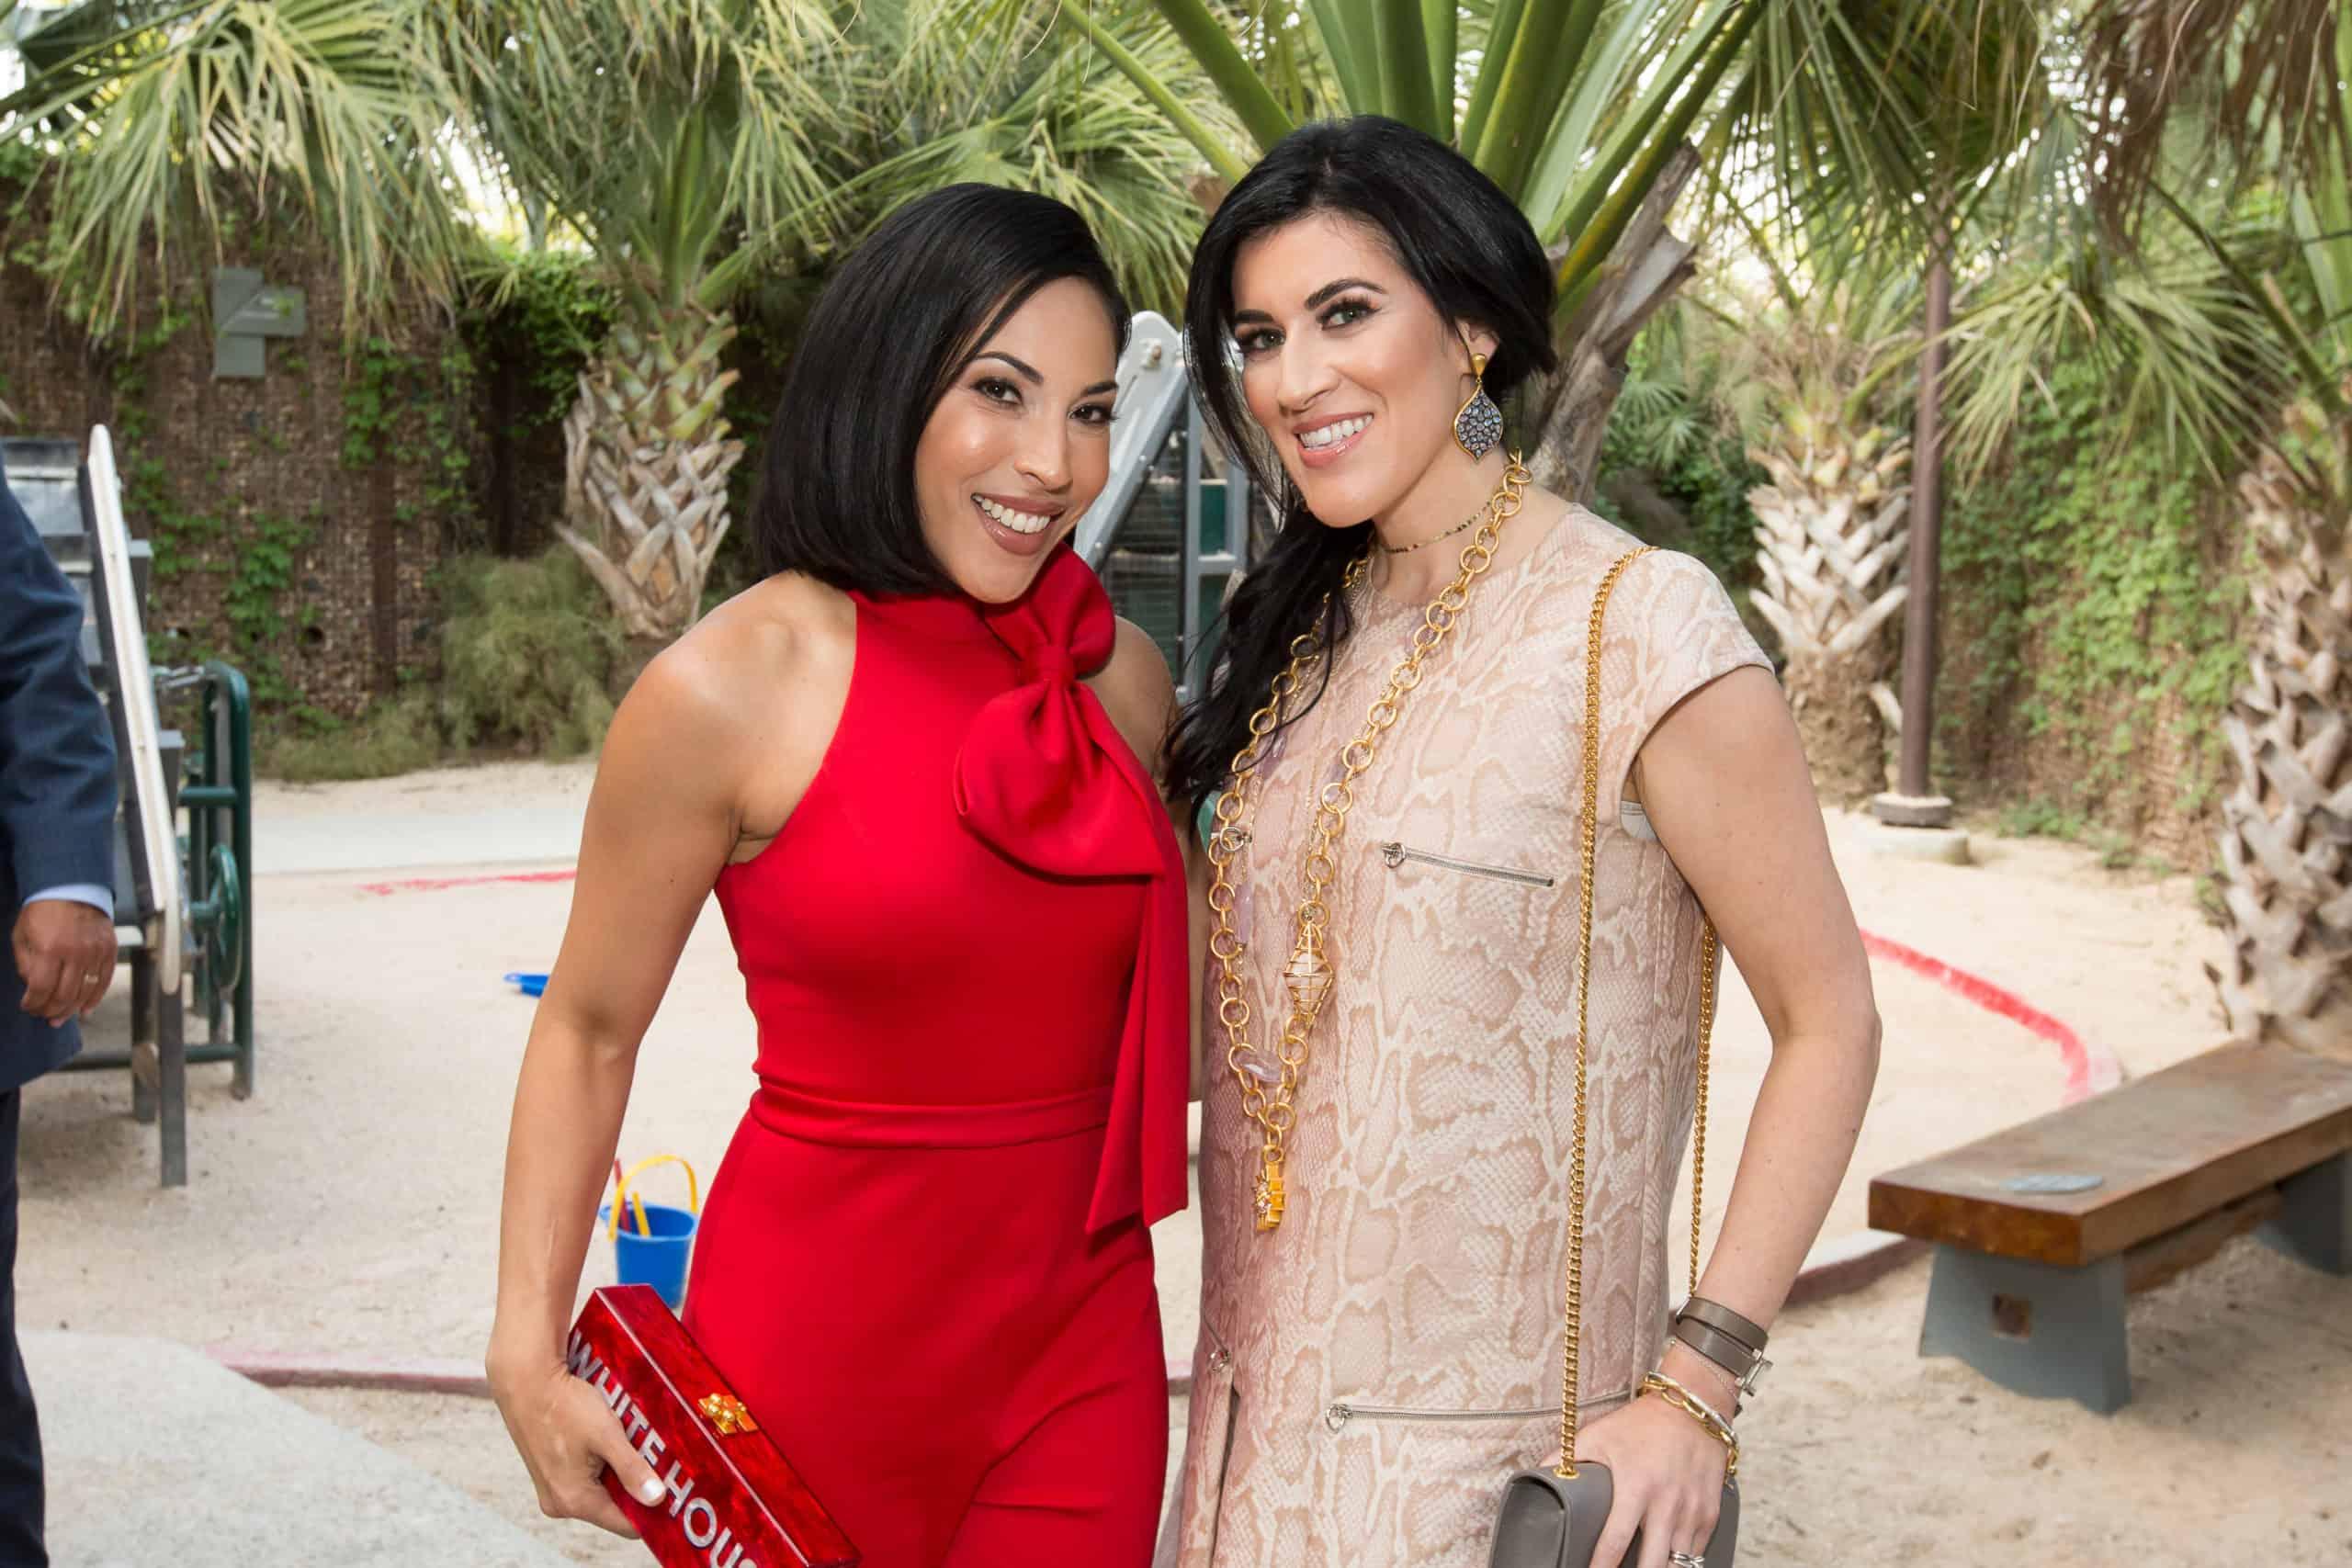 Sonya Medina Williams and Xitlalt Herrera Salazar PG 2